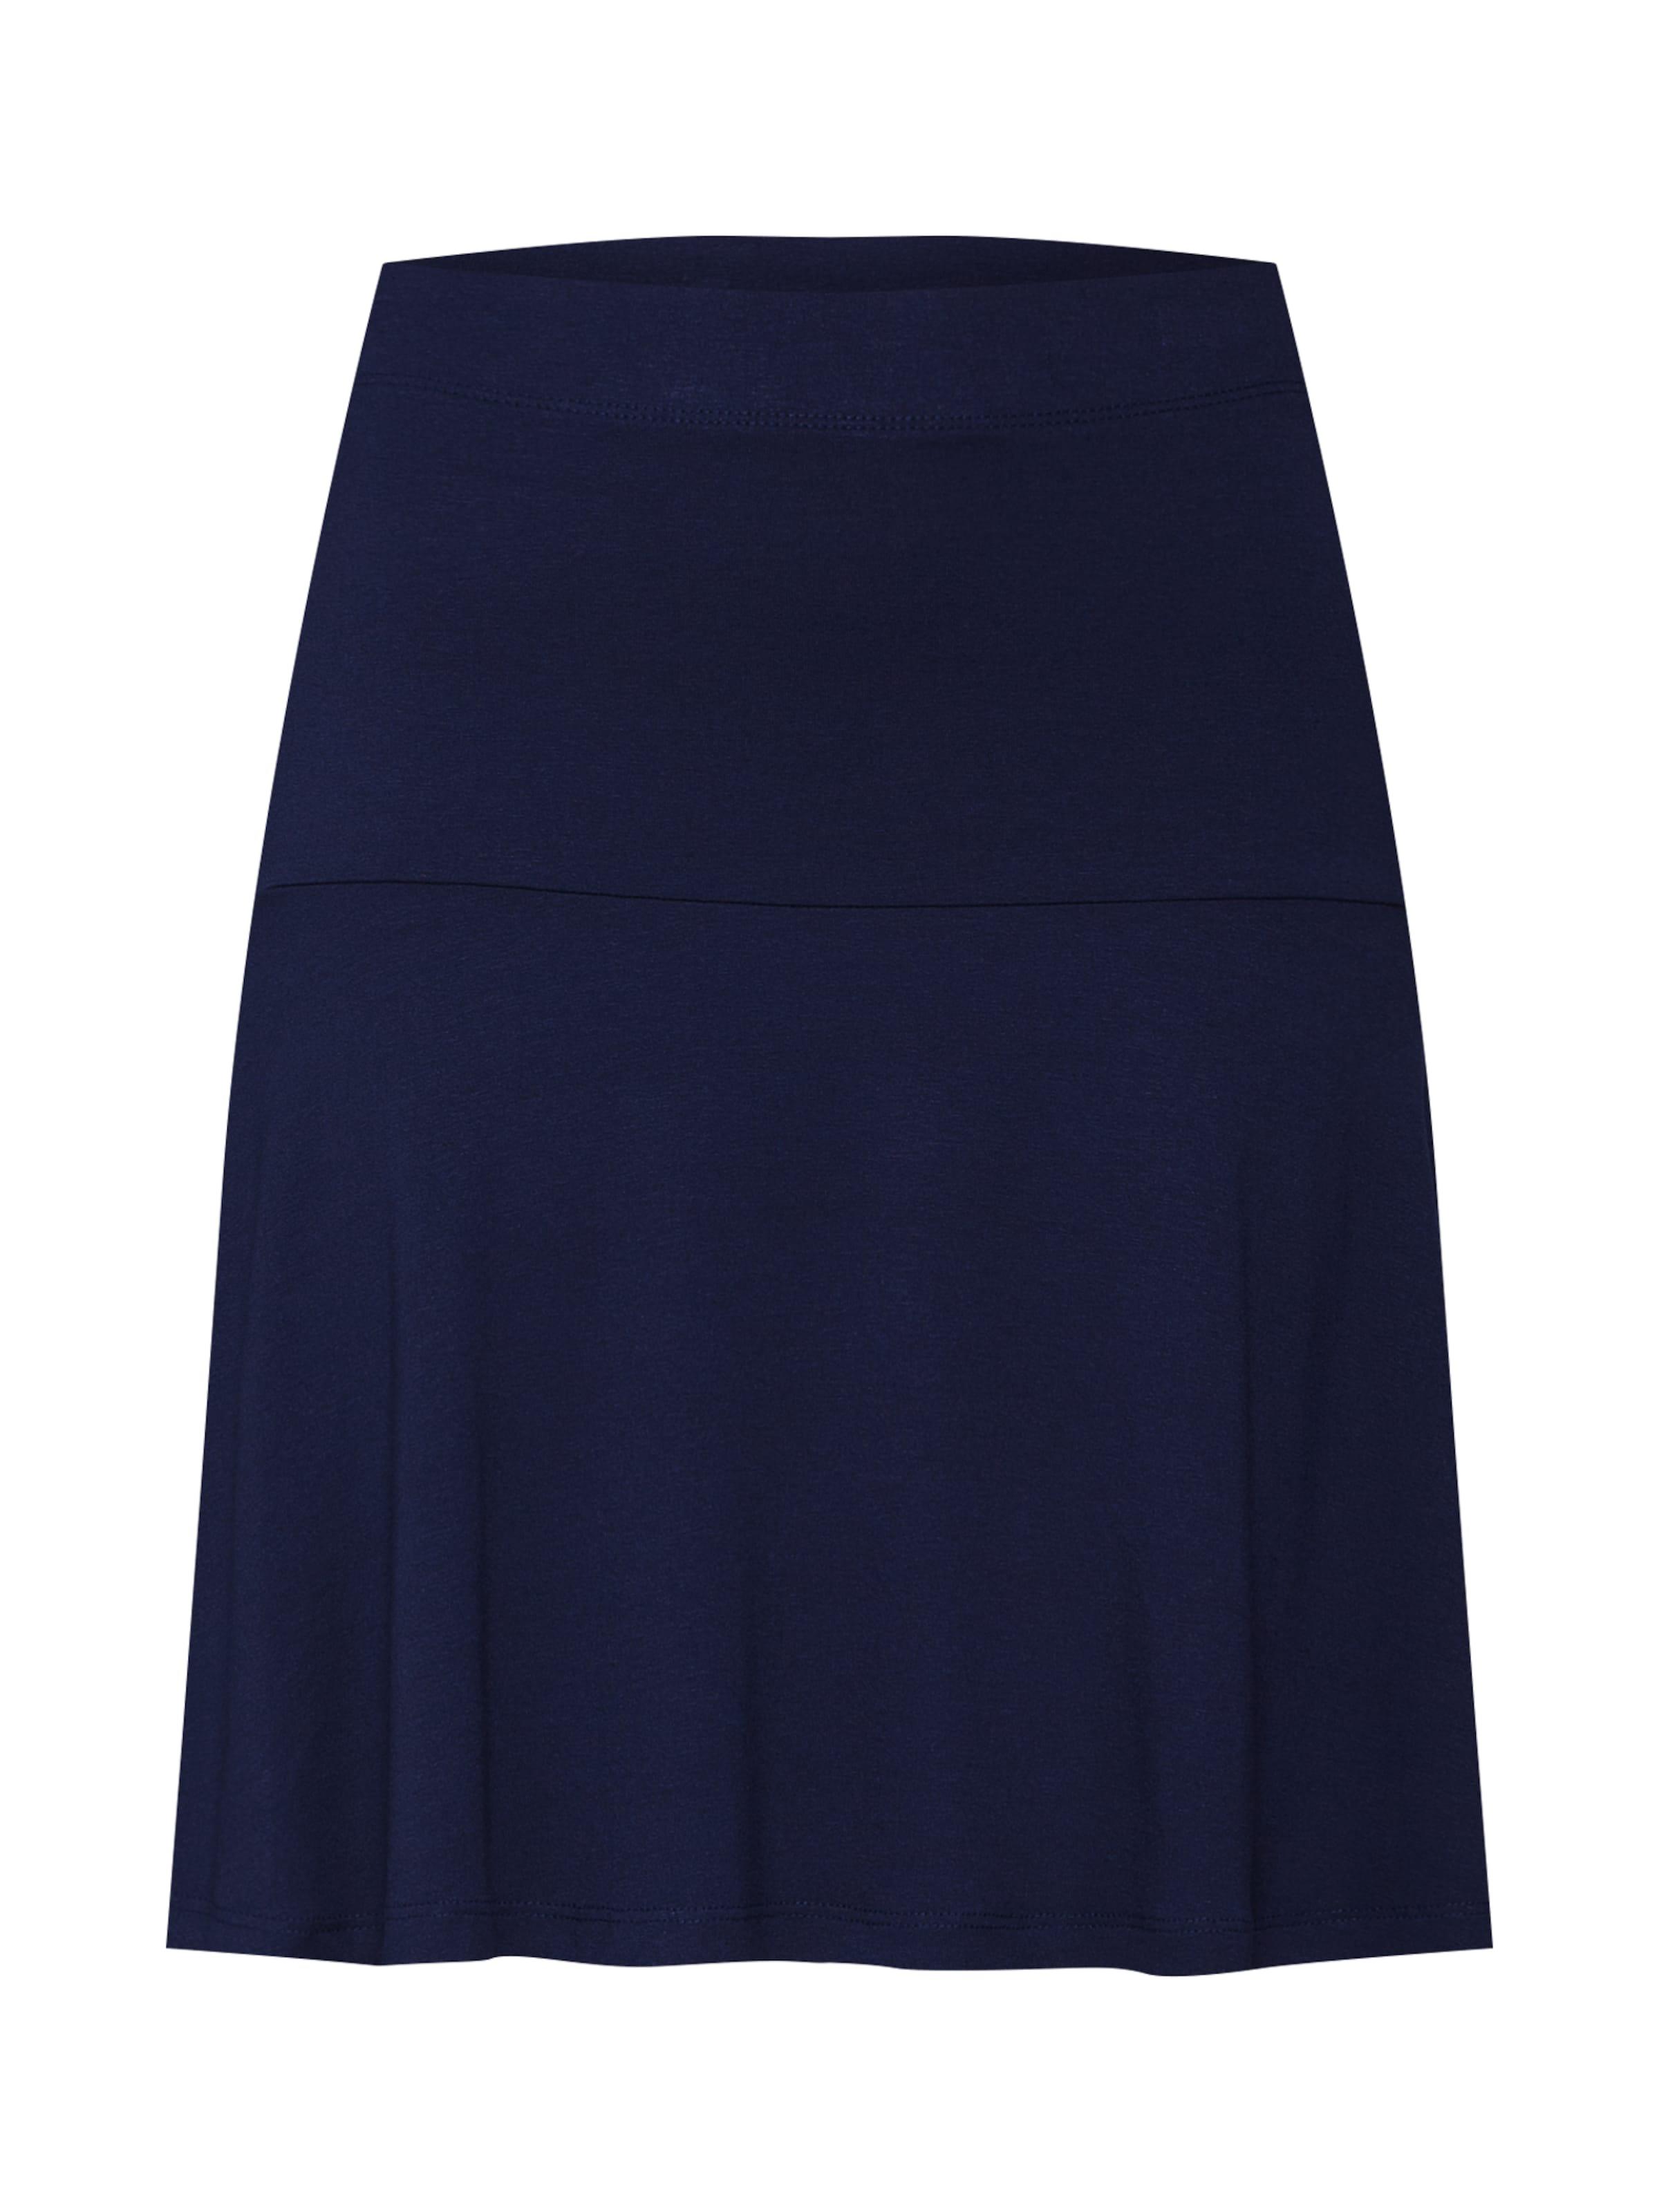 Rok In Skirt' Esprit 'eos Navy uwXiTPOZk